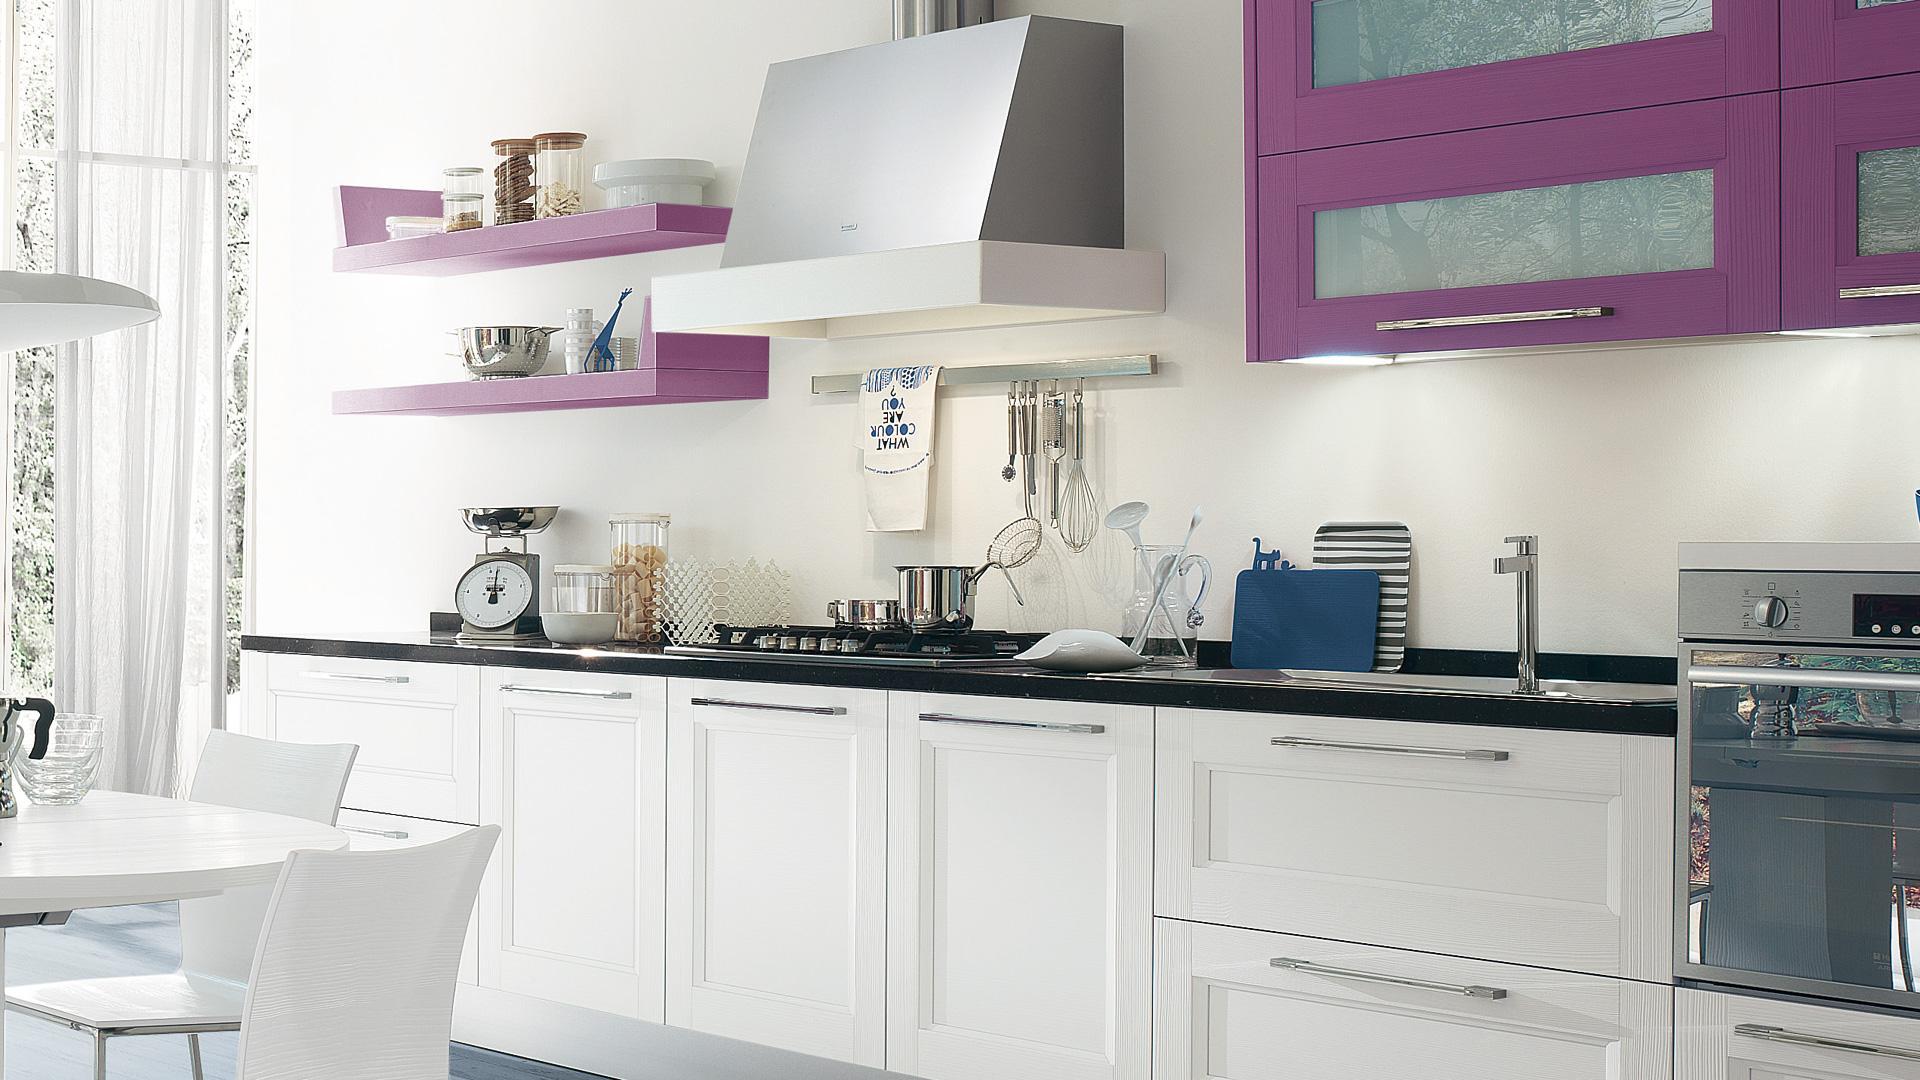 Cucina Lucrezia Mondo Convenienza - Design Per La Casa Moderna ...